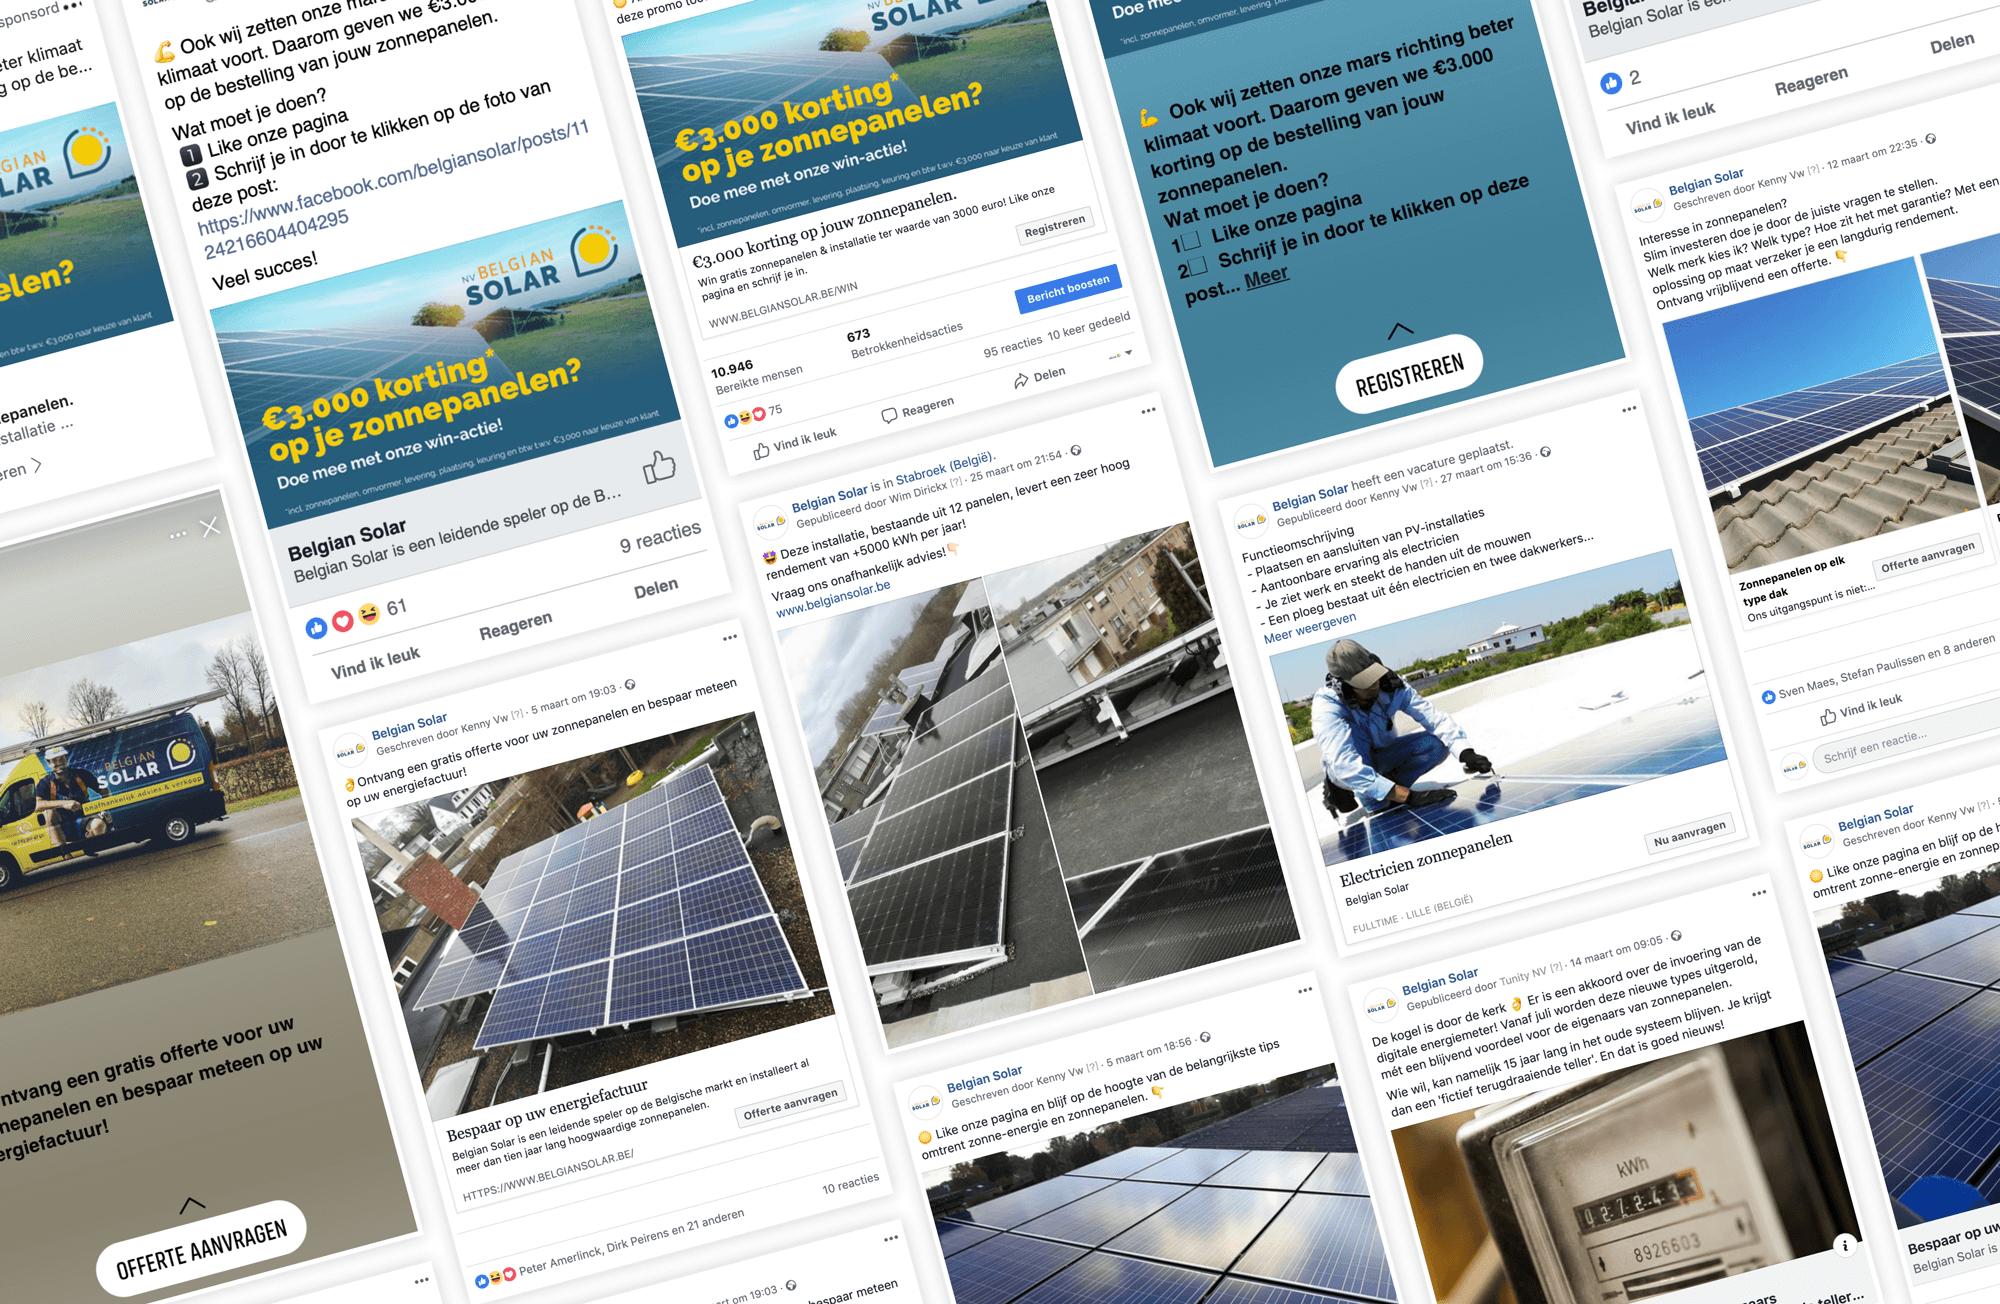 social media belgian solar